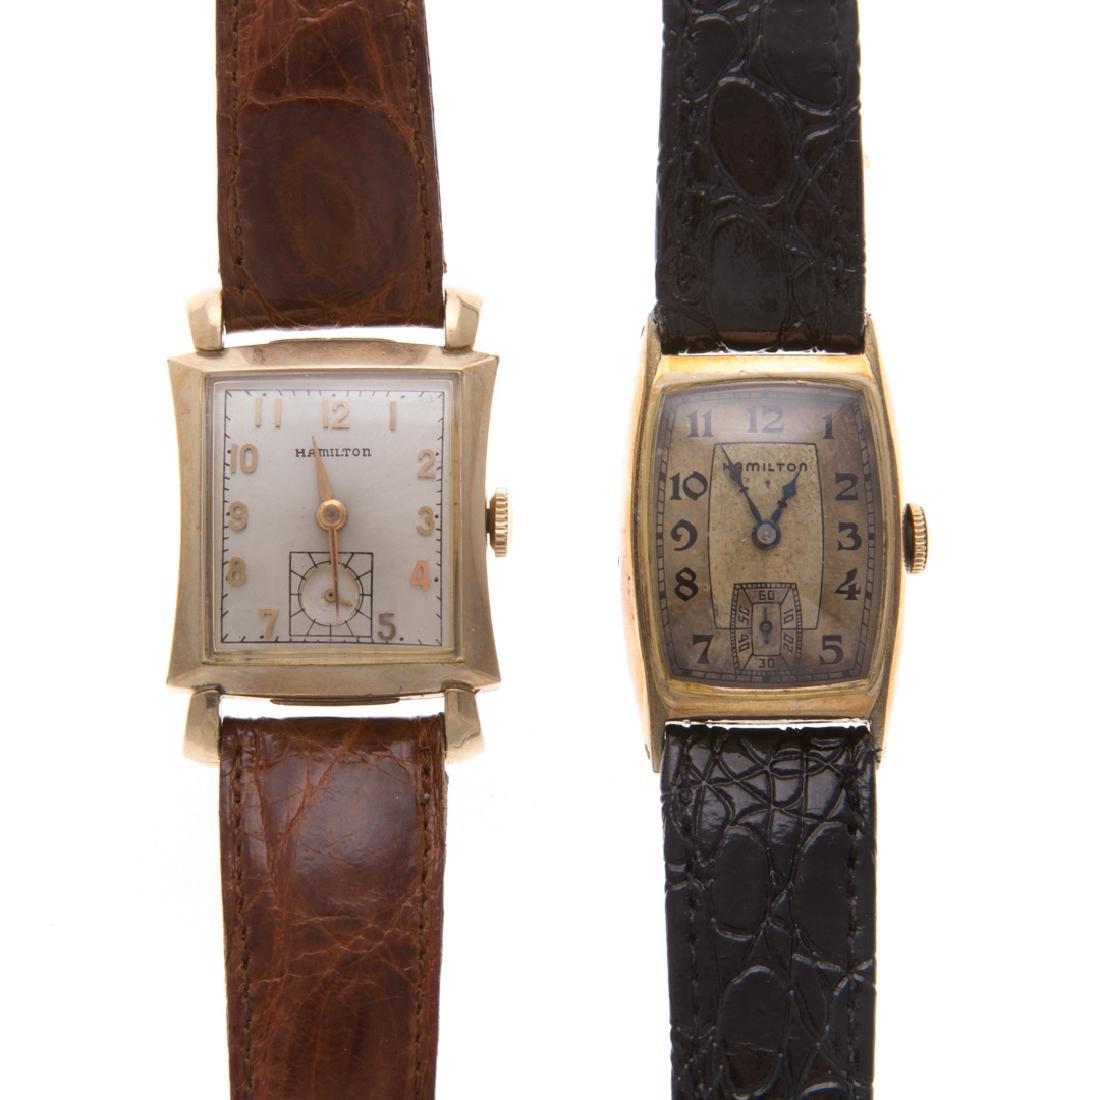 Two Vintage Gent's Hamilton Wrist Watches